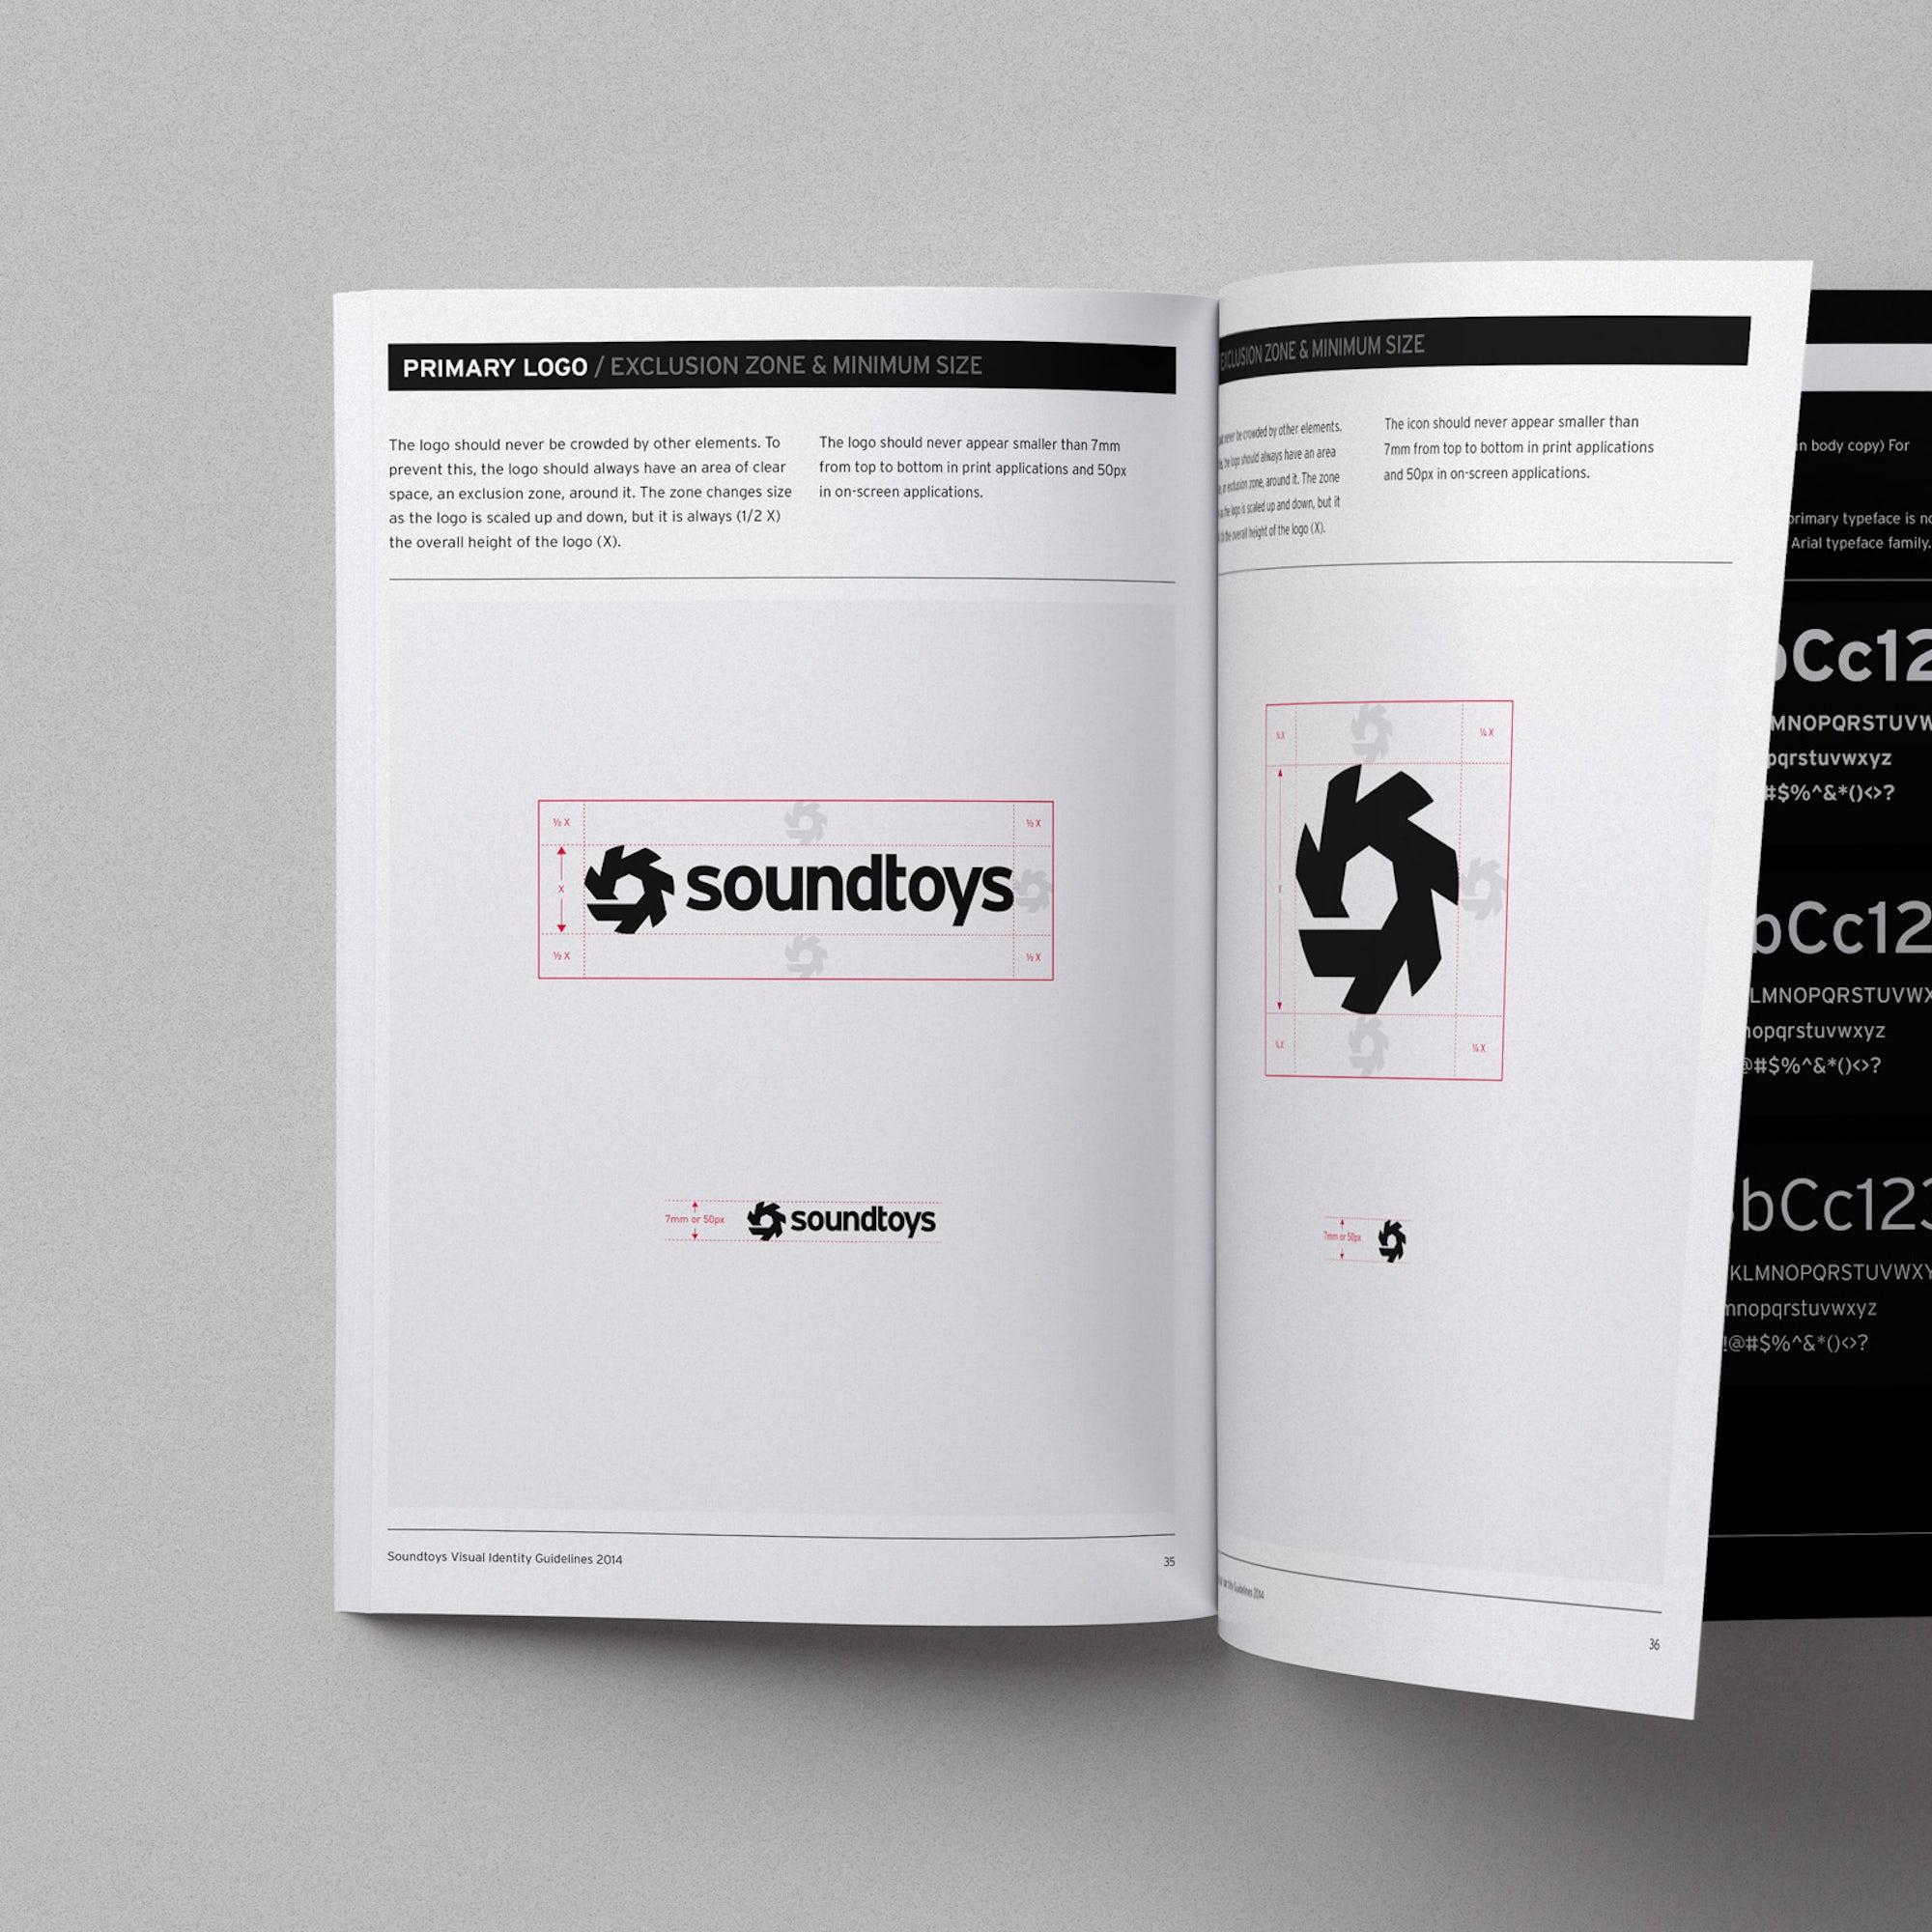 Soundtoys Brand Identity Design for Music Software